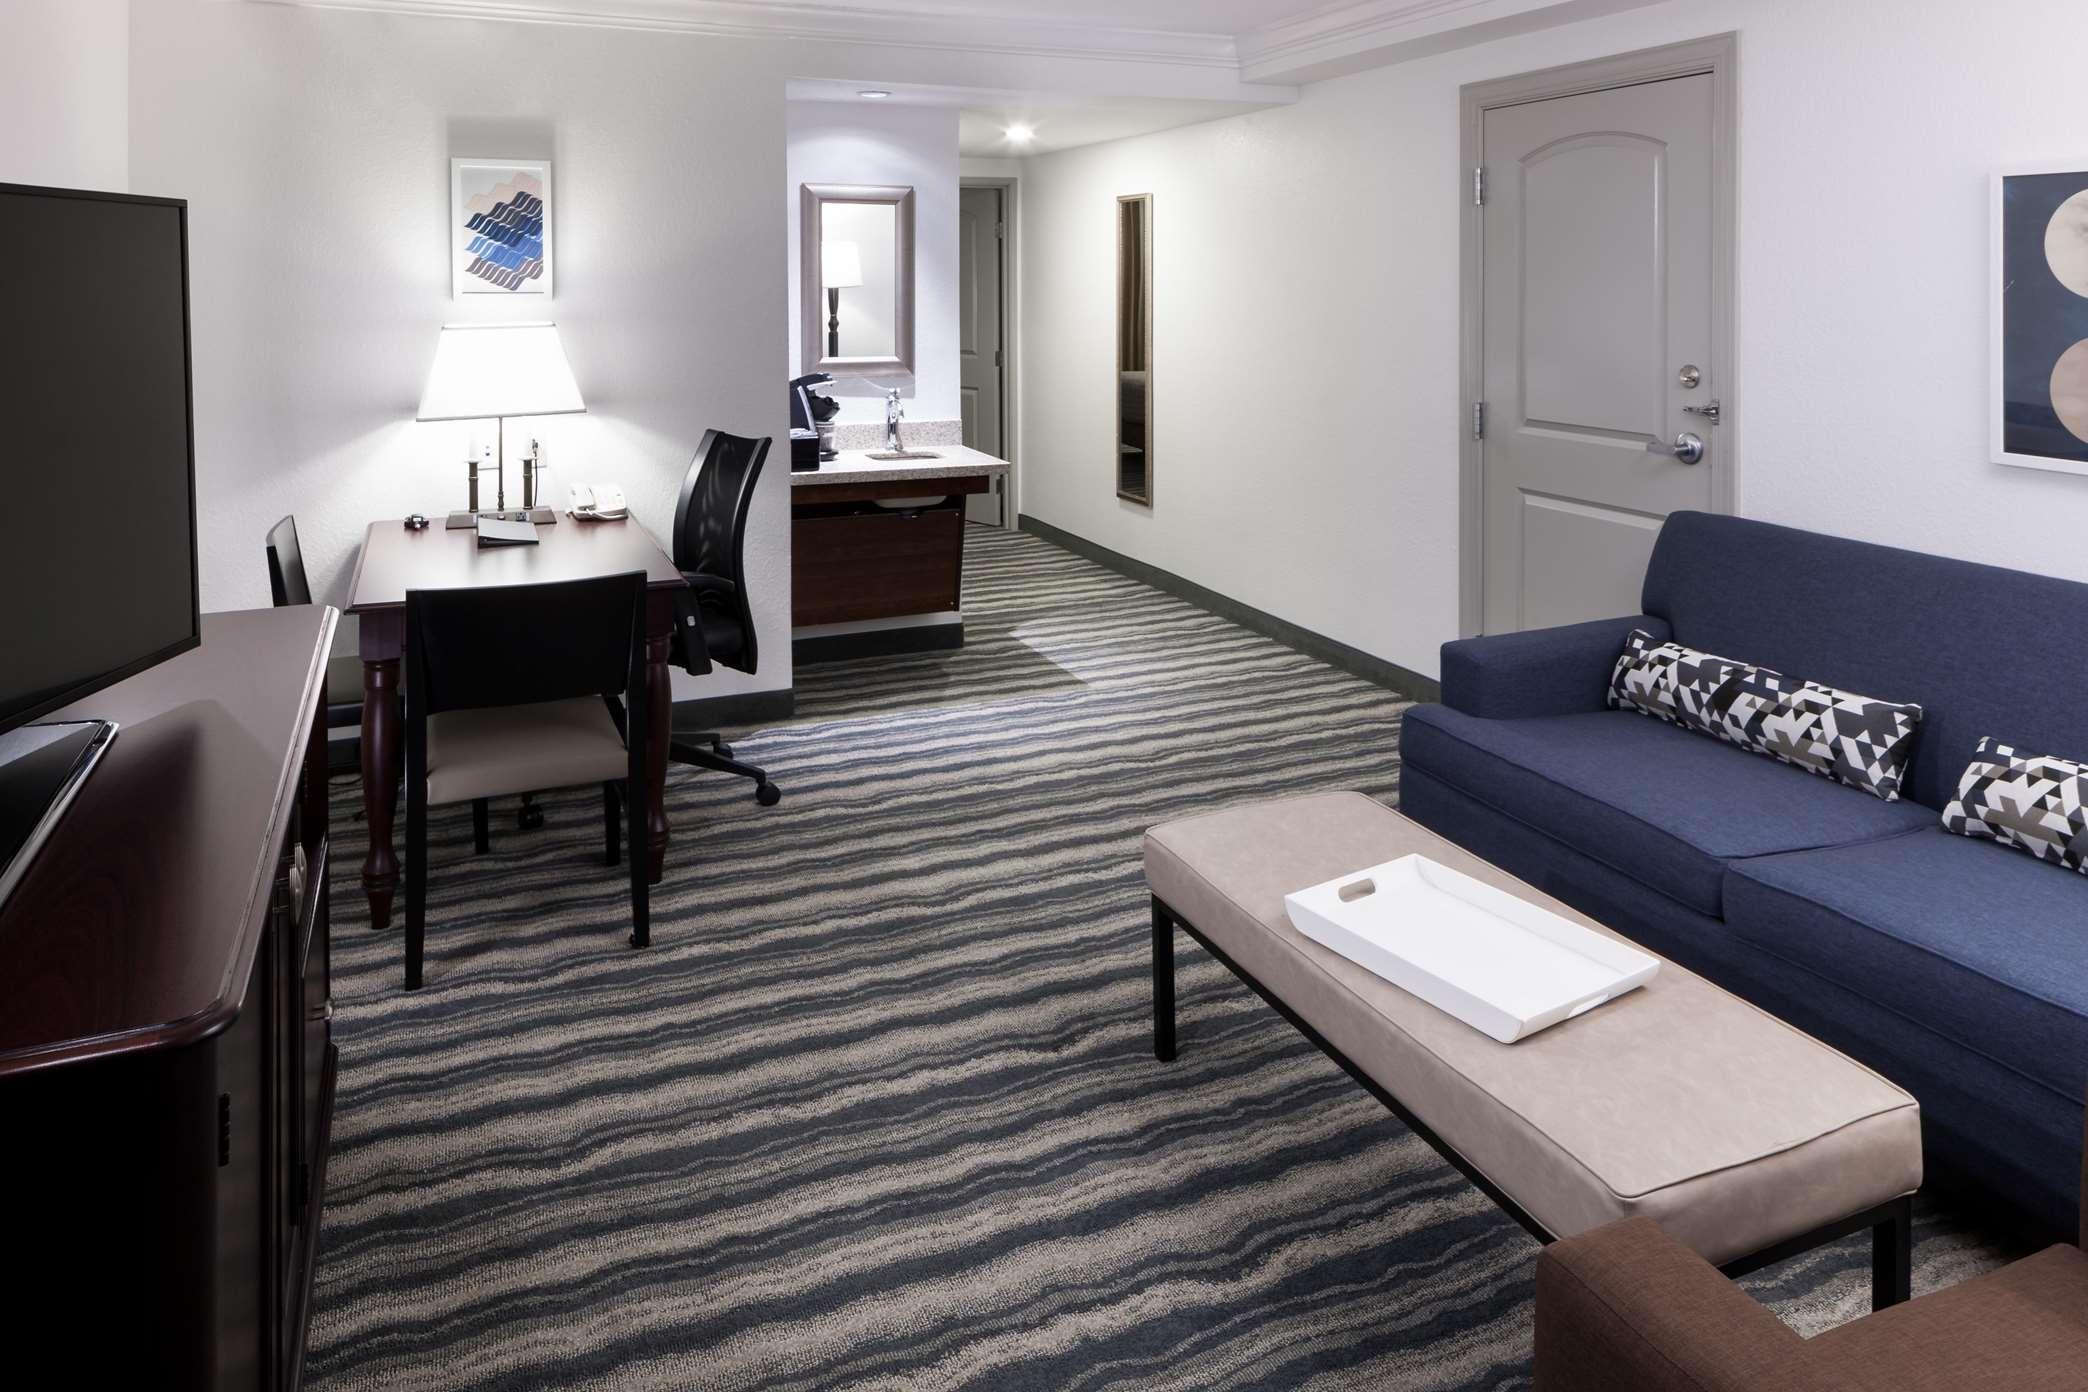 Embassy Suites by Hilton Tampa Brandon image 4